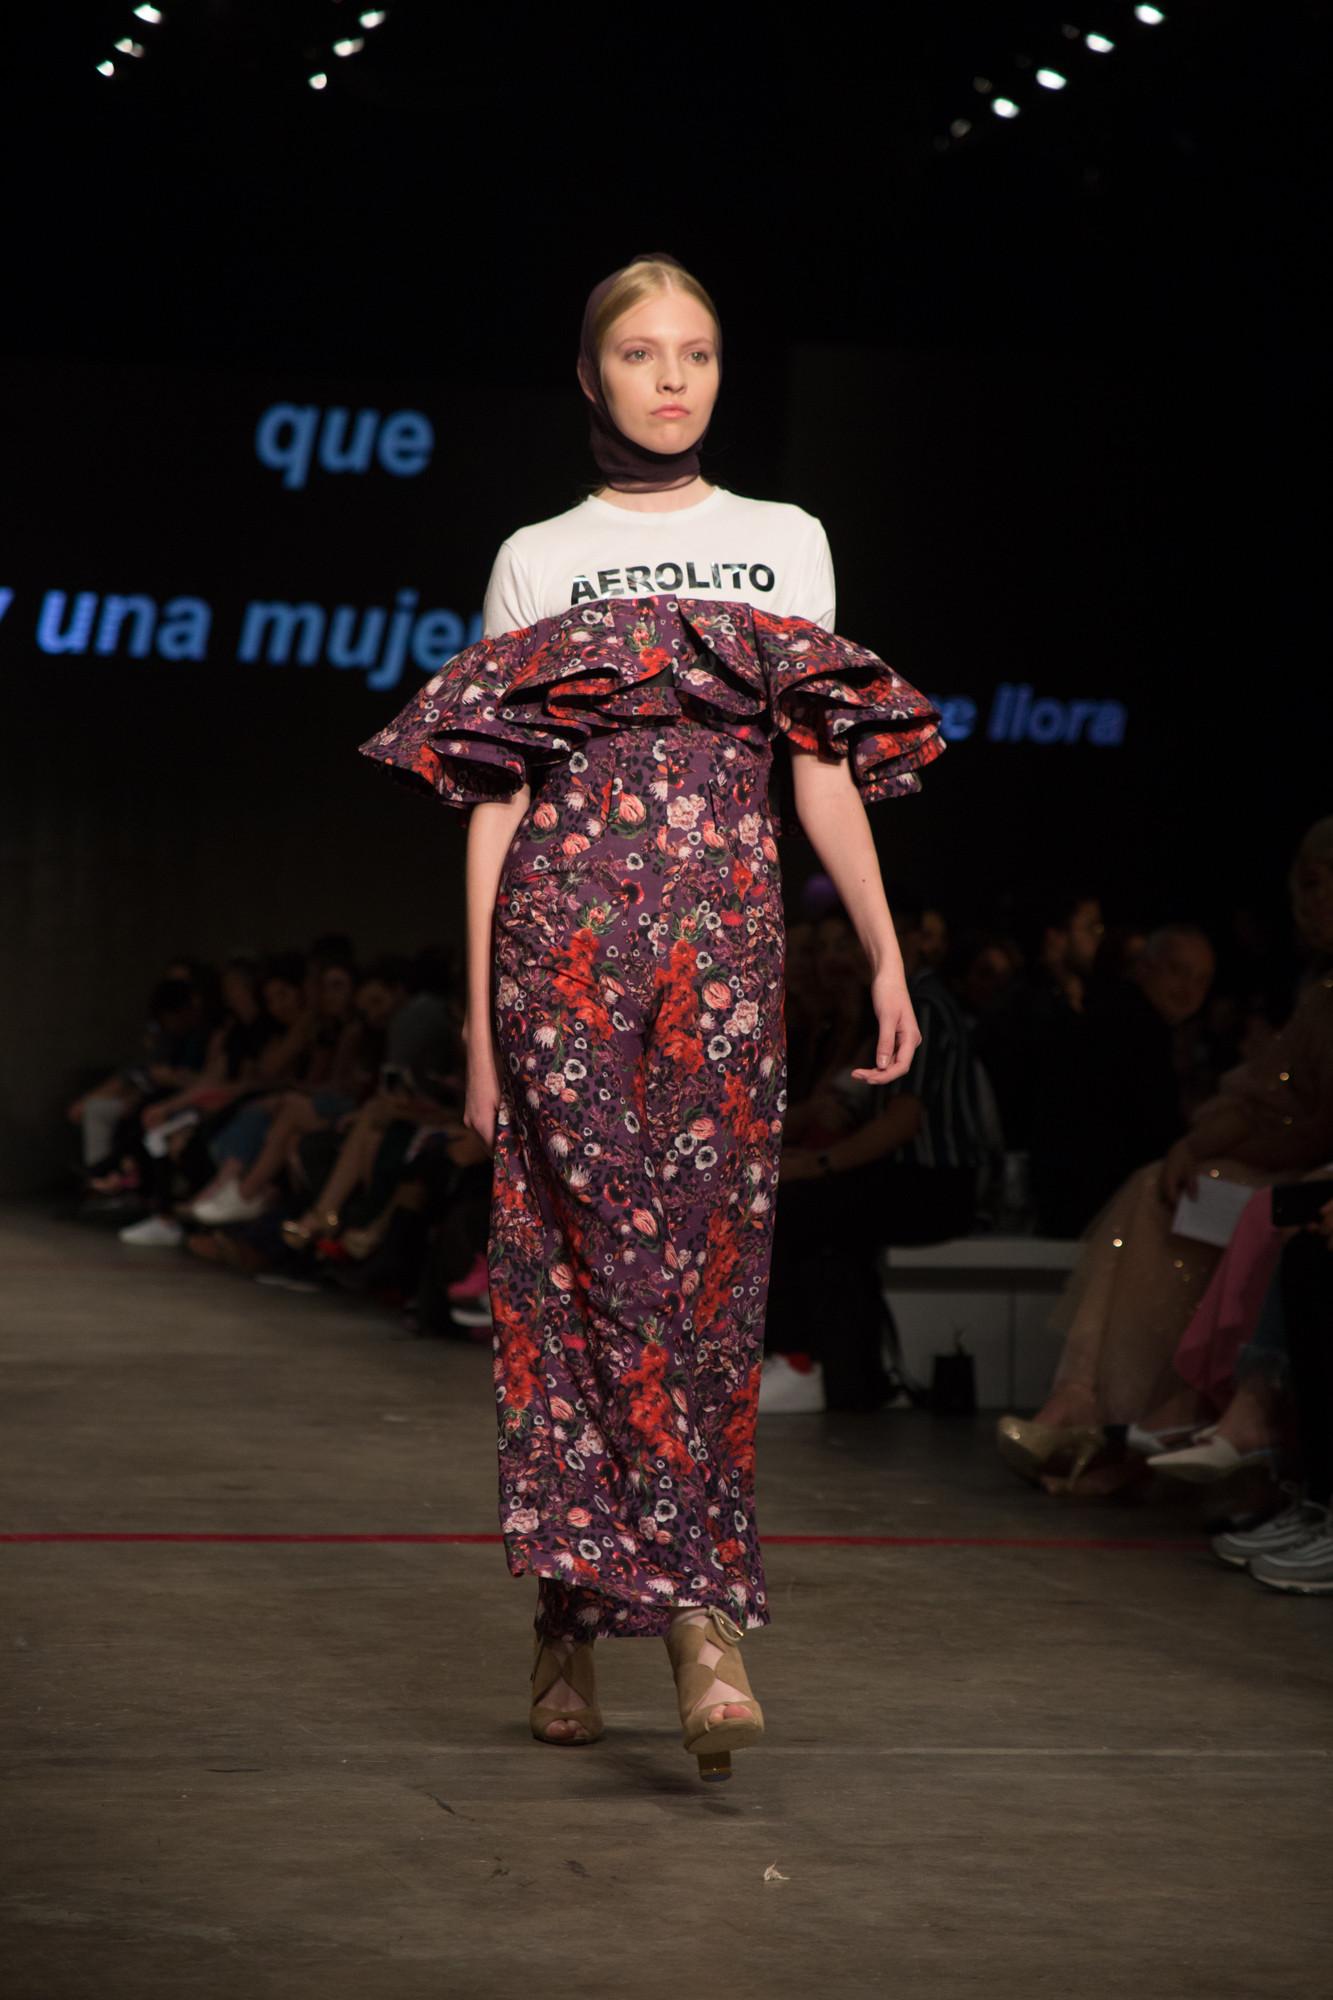 MBFWMX18, Alexia Ulibarri